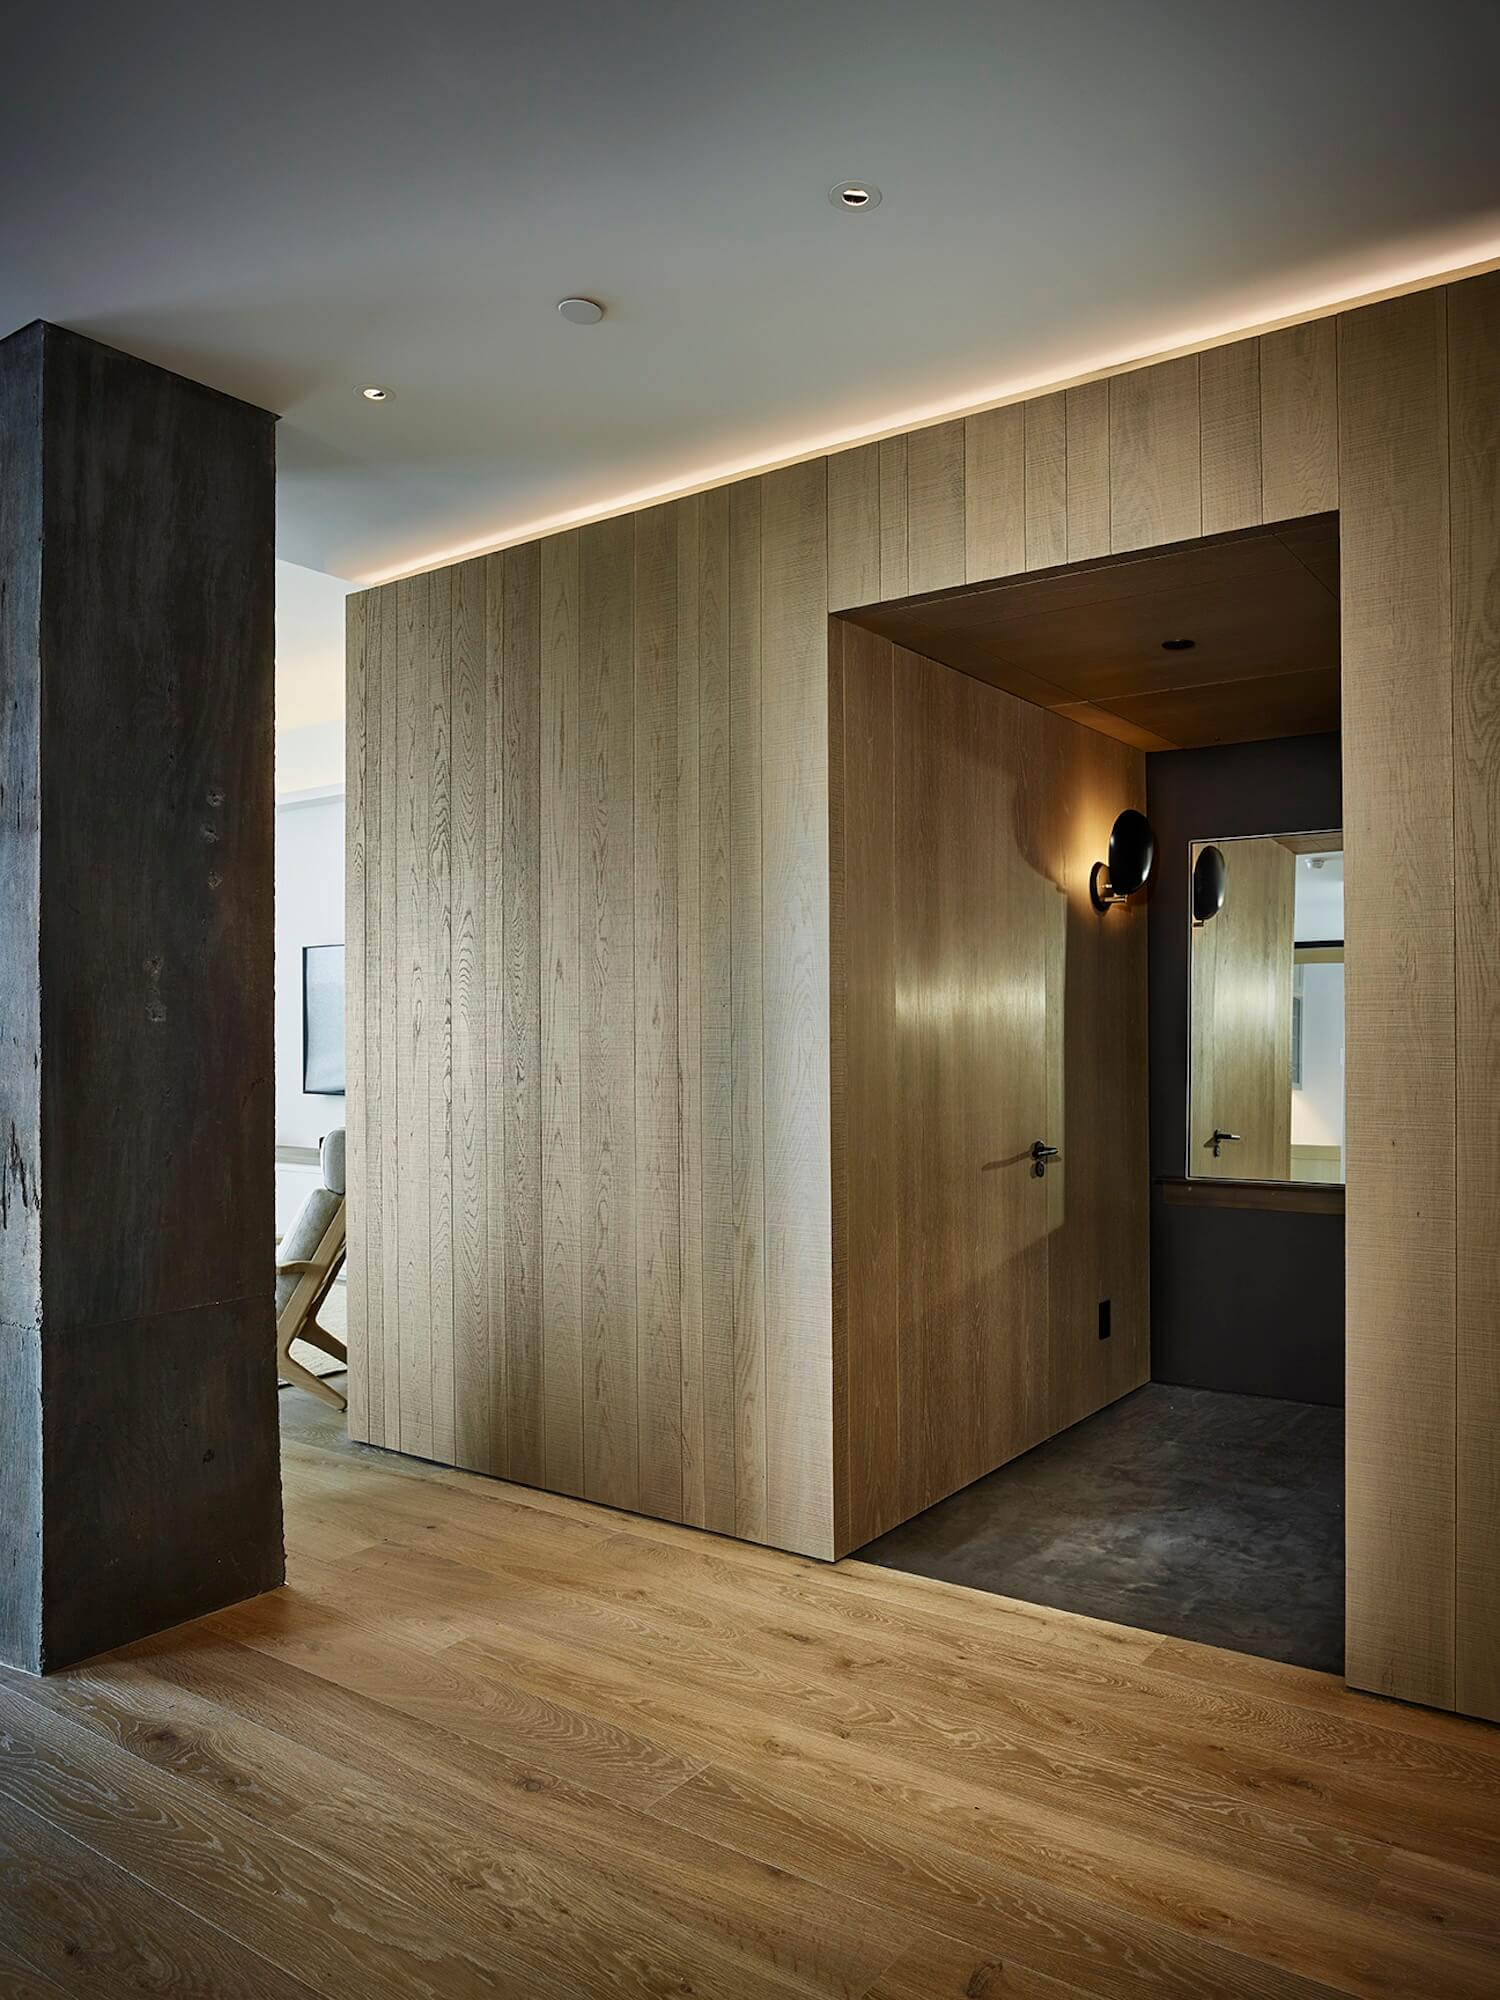 est living global interiors river loft robert young architects RRA 12 LAIGHT F.OUDEMAN 2015 ¬ 08